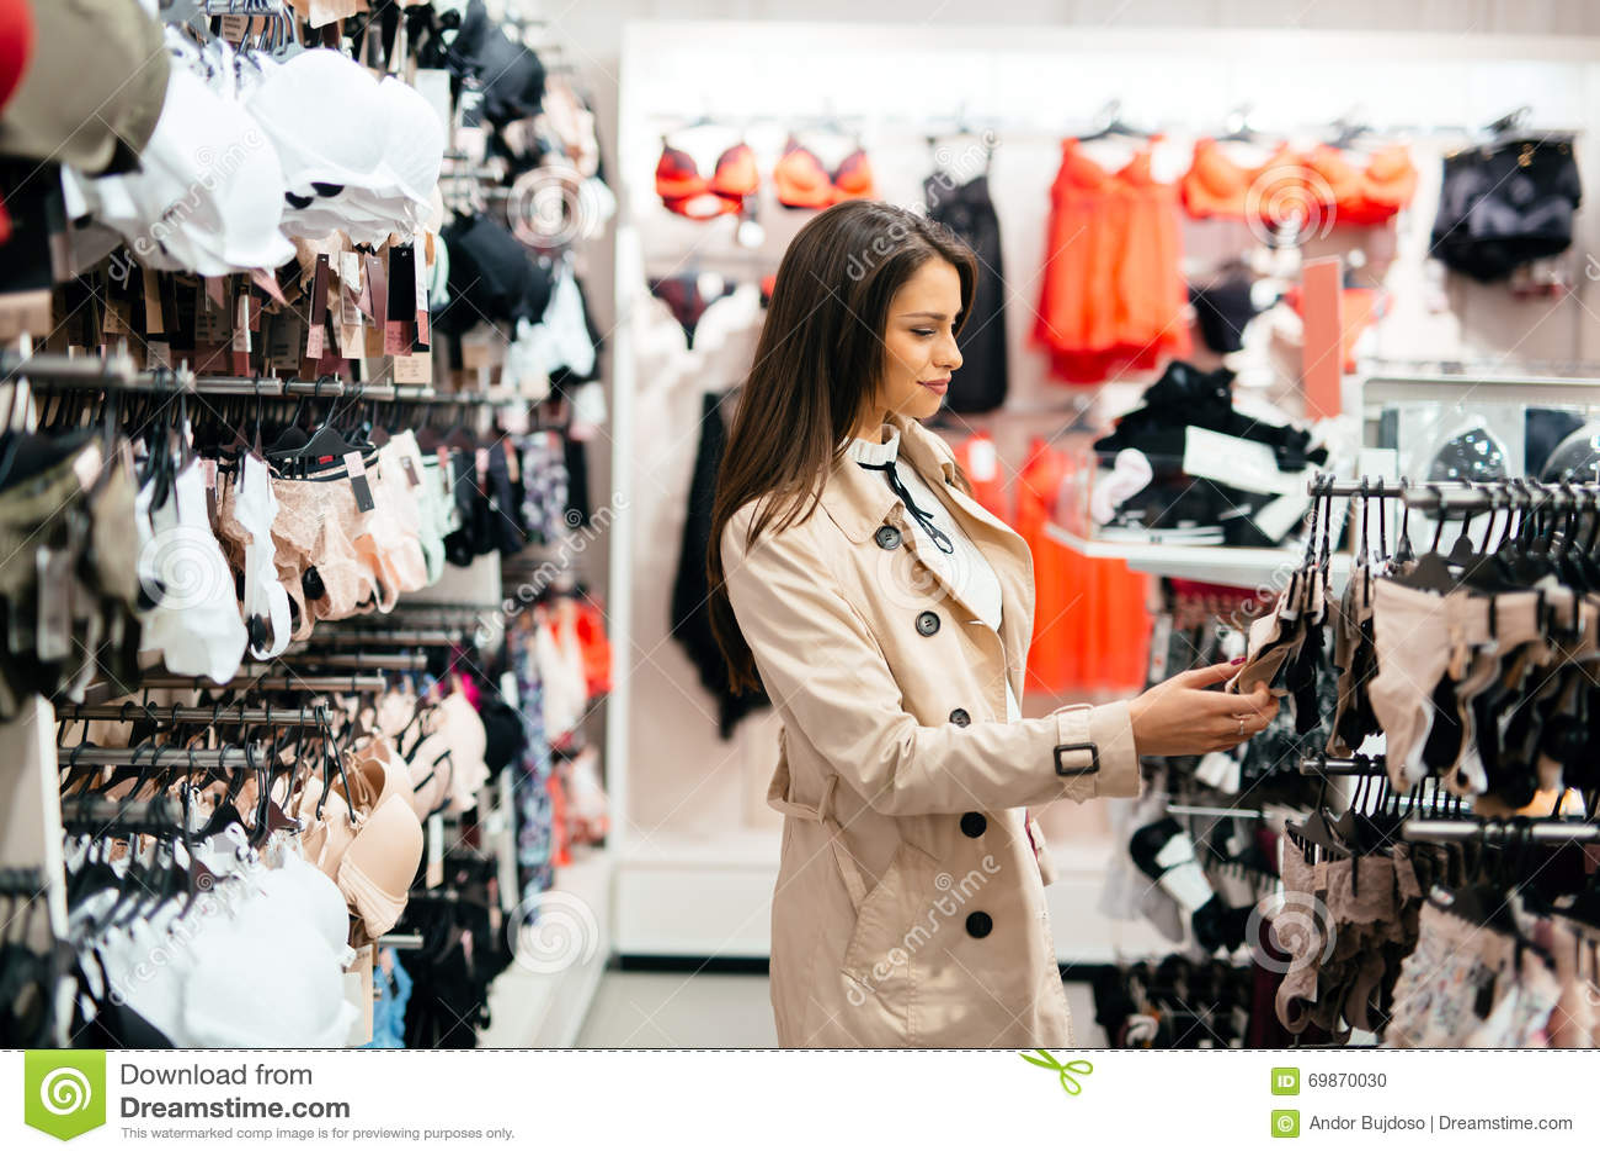 Beautiful Woman Shopping Lingerie Stock Photo - Image: 69870030